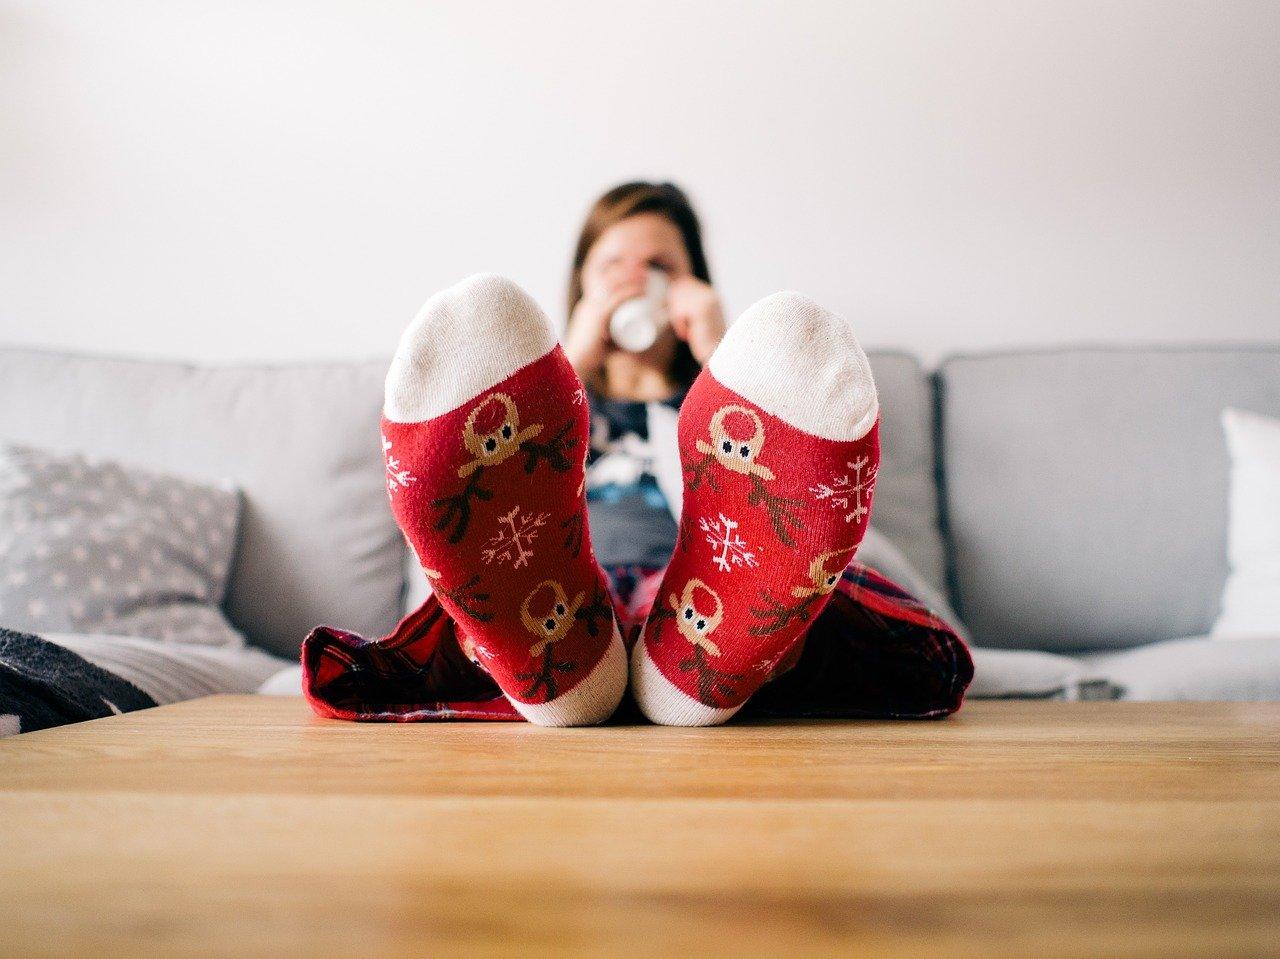 couch feet christmas socks